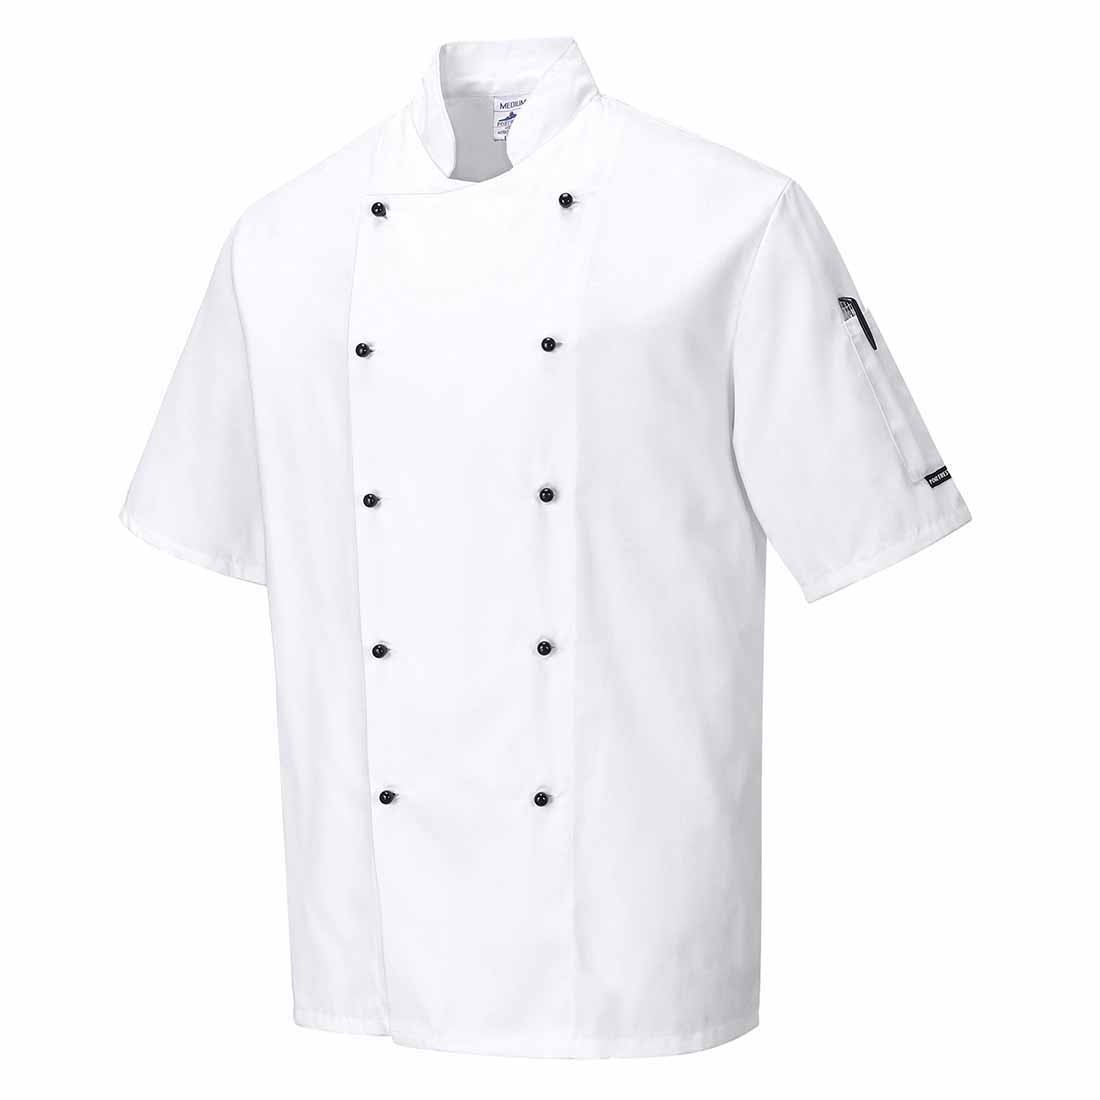 Regular X-Small Black Portwest C734BKRXS Kent Chefs Jacket